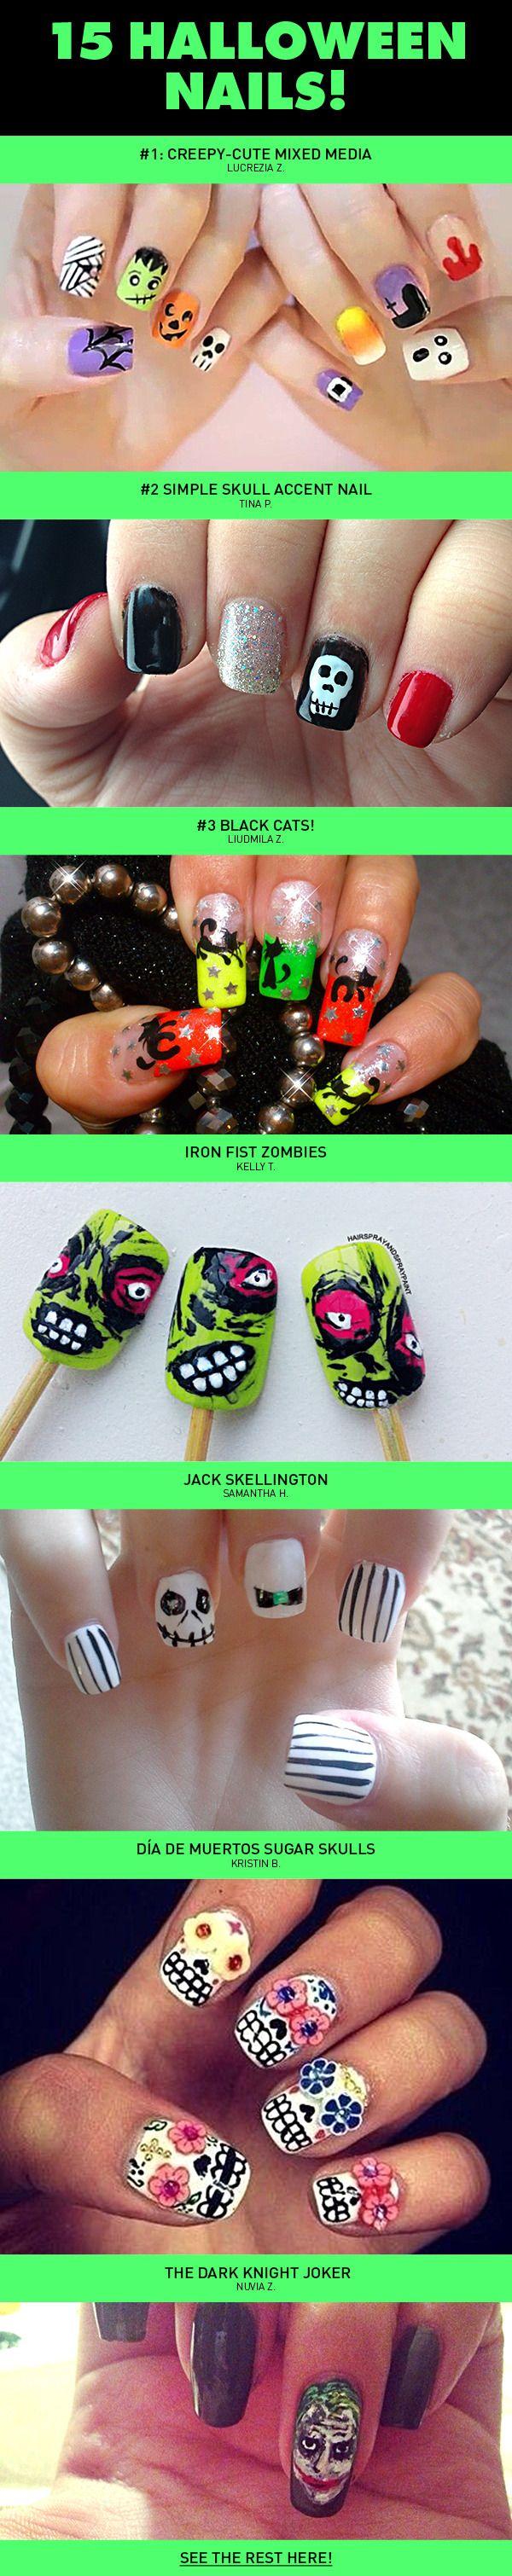 15 Halloween Nail Art Looks | Ideas de arte en uñas, Cepillos y Uñas ...